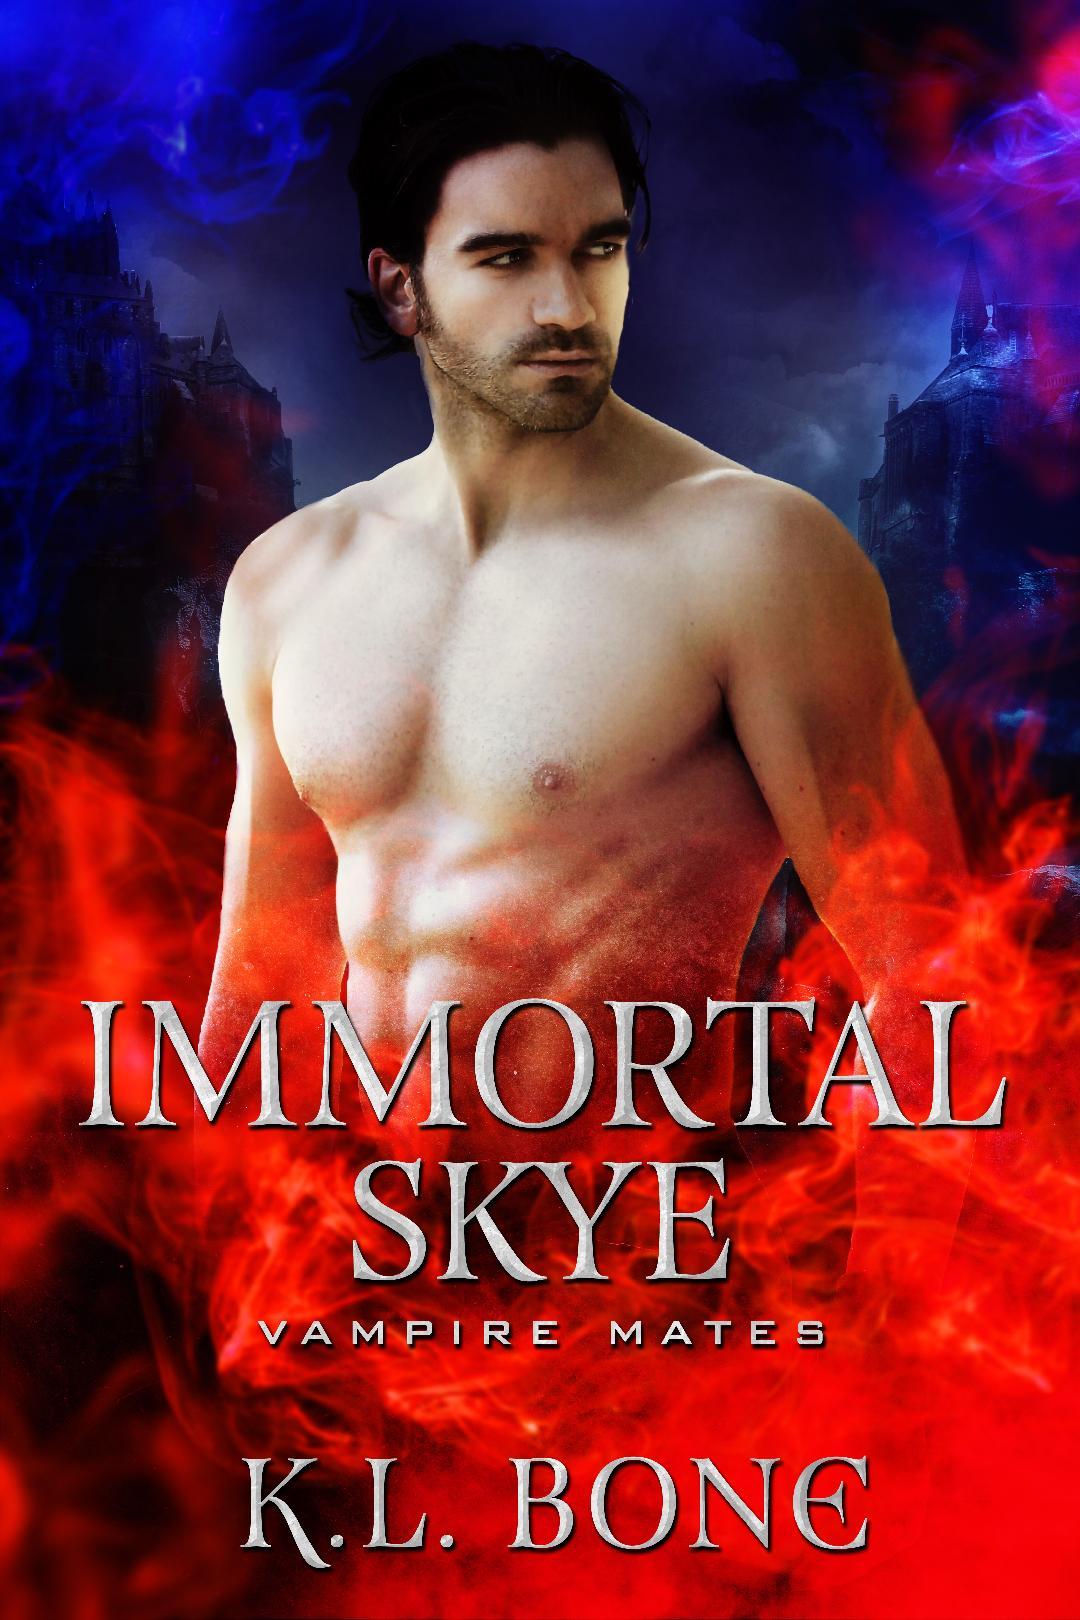 IMMORTAL SKYE (A Vampire Mates Novella) Book Cover